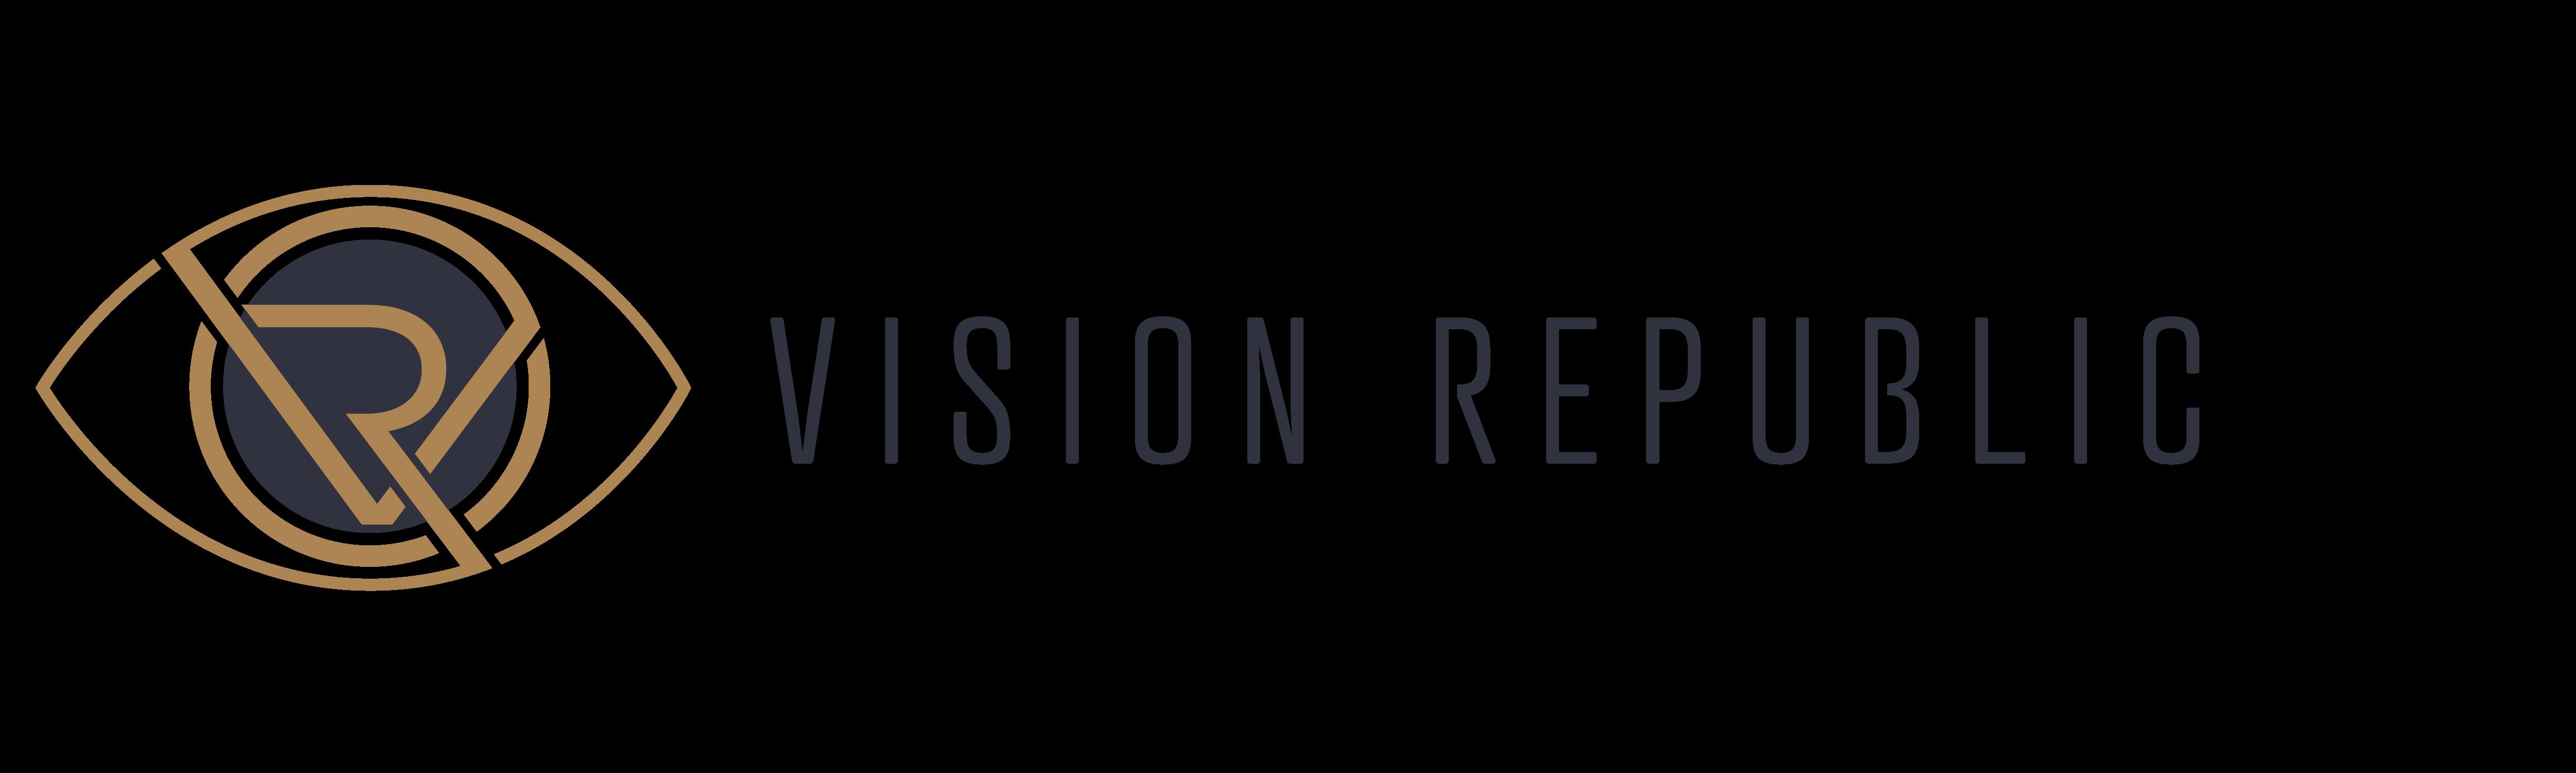 Vision Republic Logo